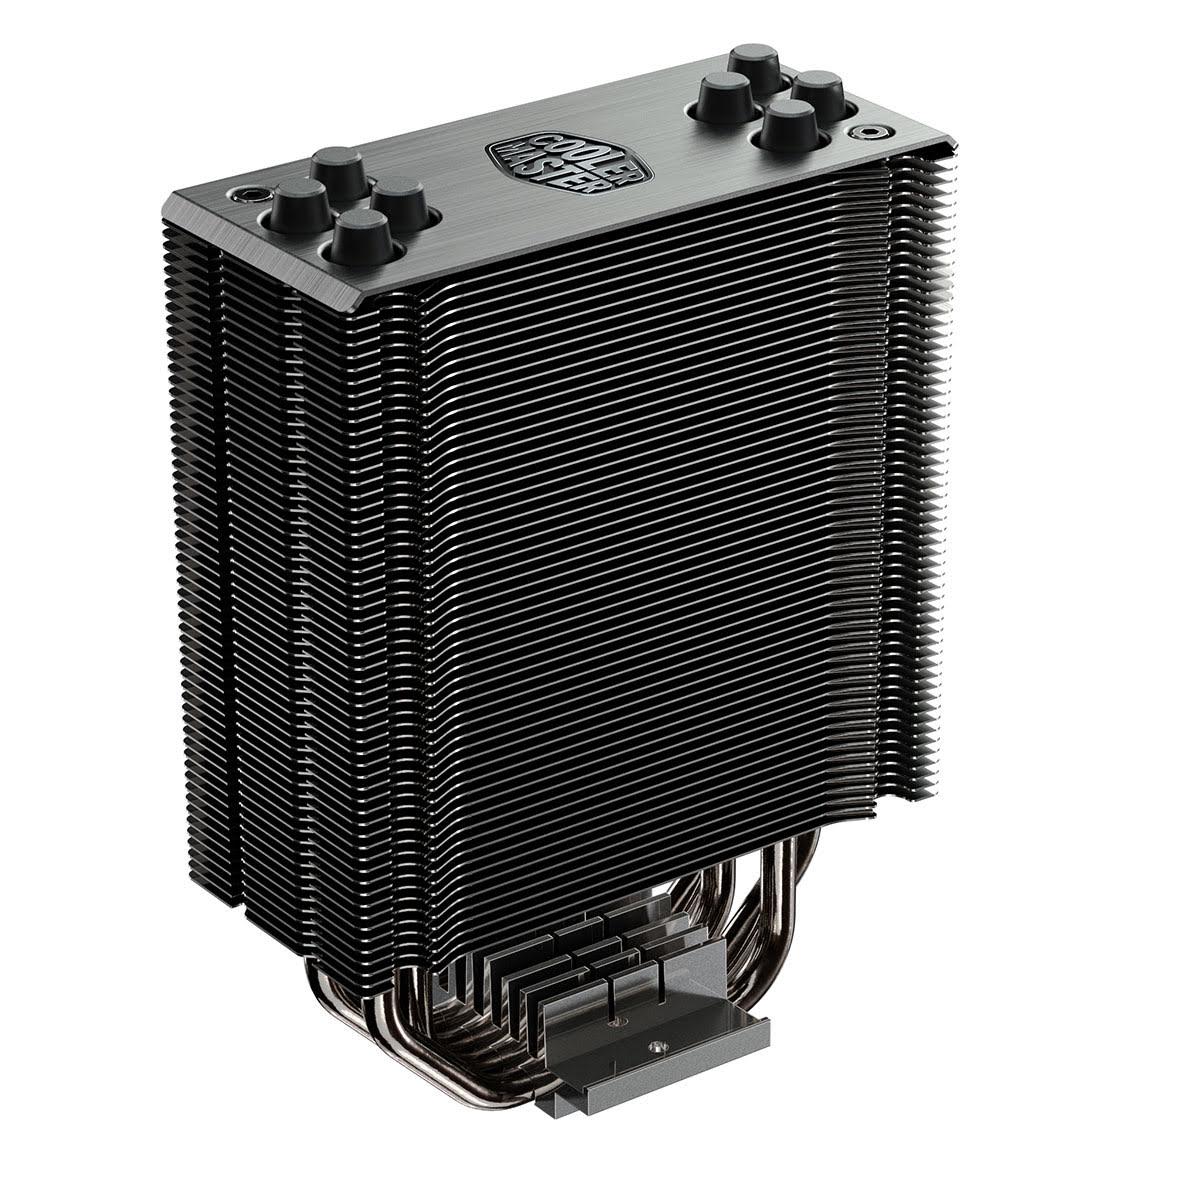 Cooler Master RR-212S-20PC-R1 - Ventilateur CPU Cooler Master - 1